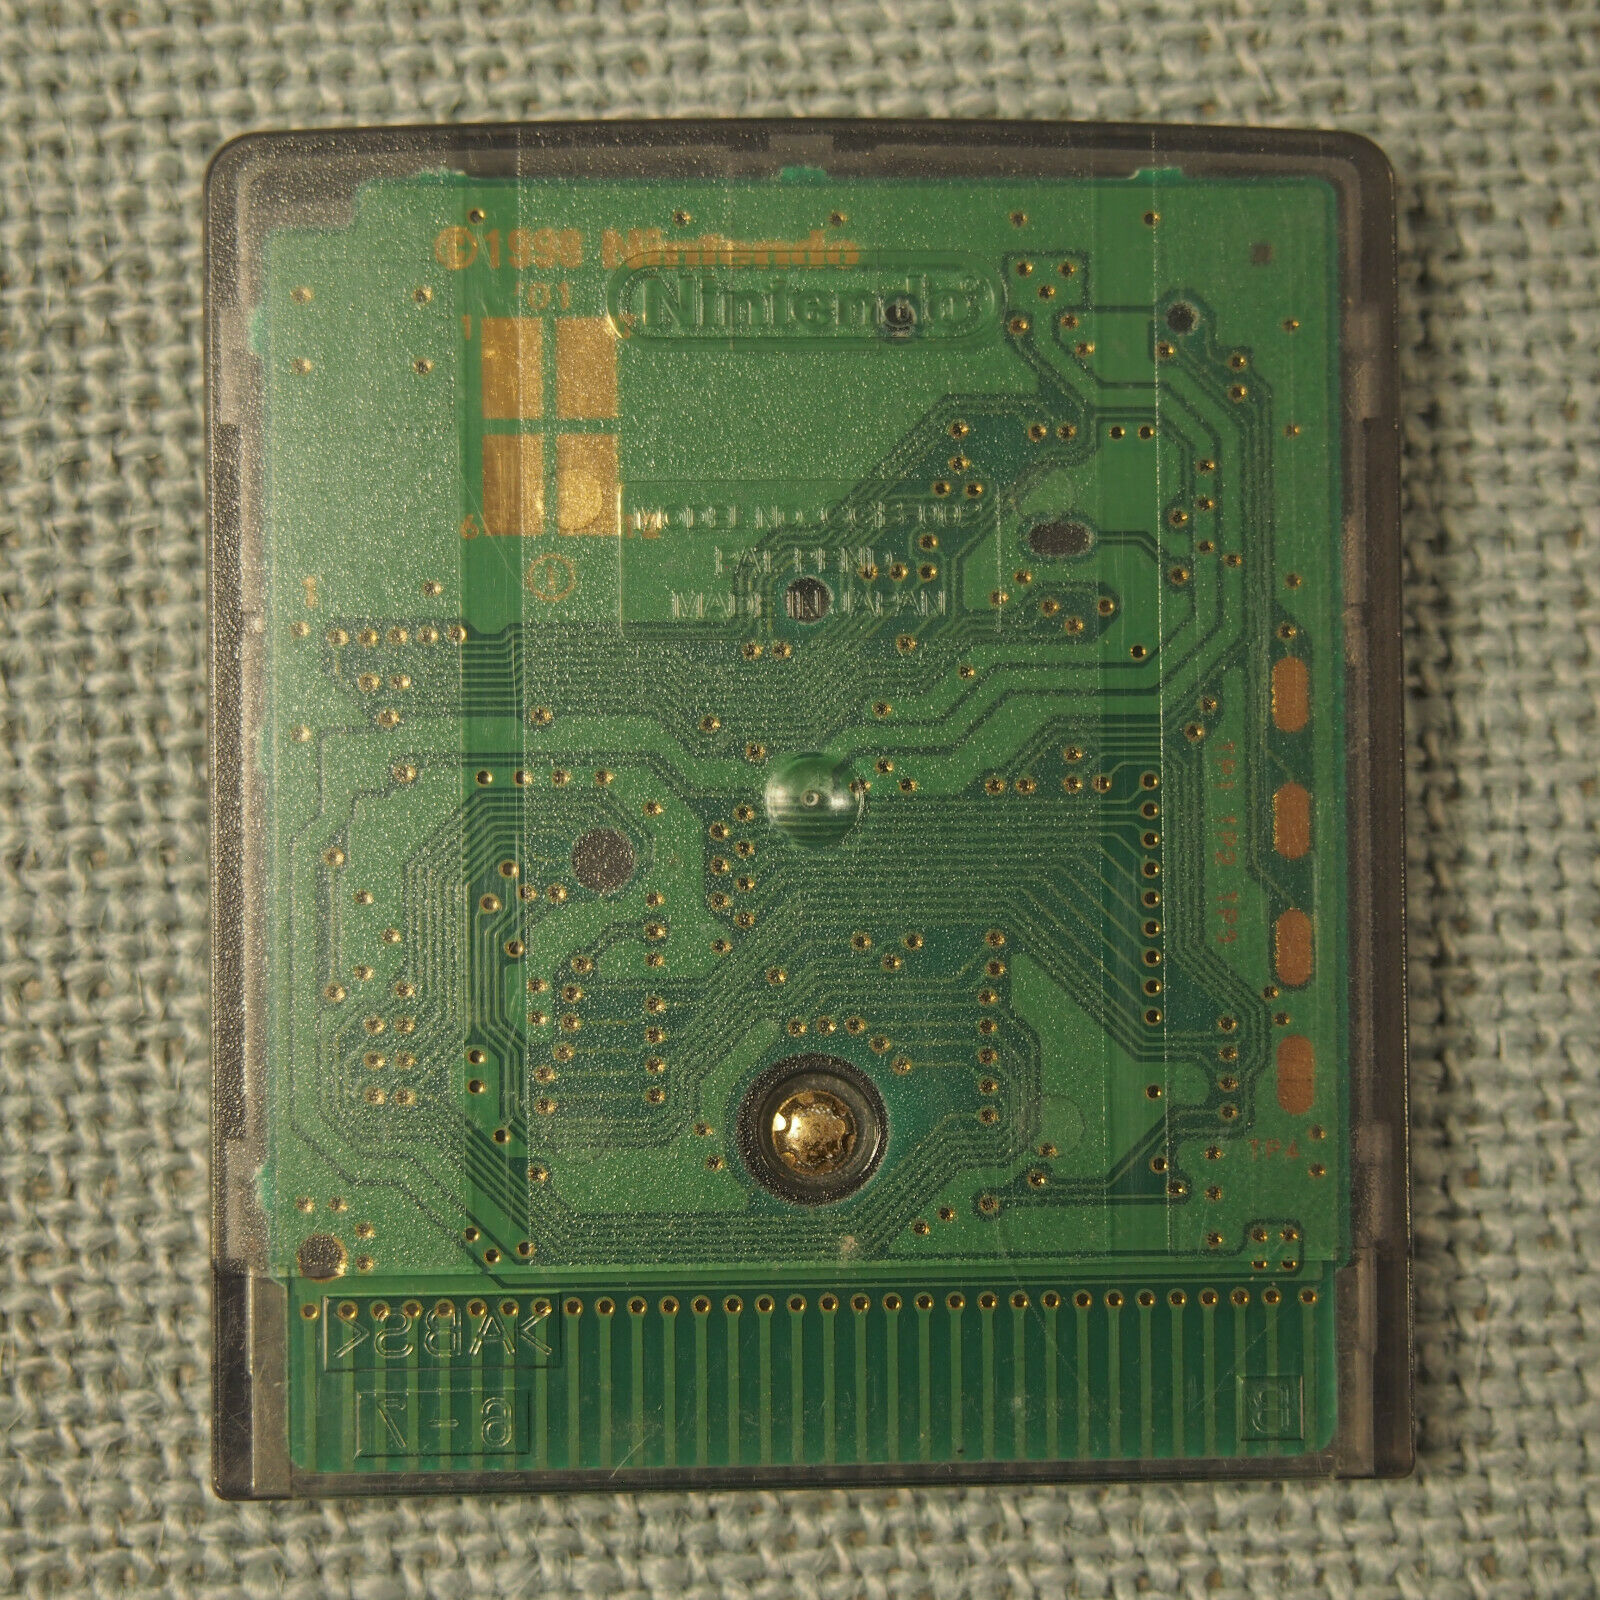 Kisekae Series 2: Oshare Nikki (Nintendo Game Boy Color GBC, 2001) Japan Import